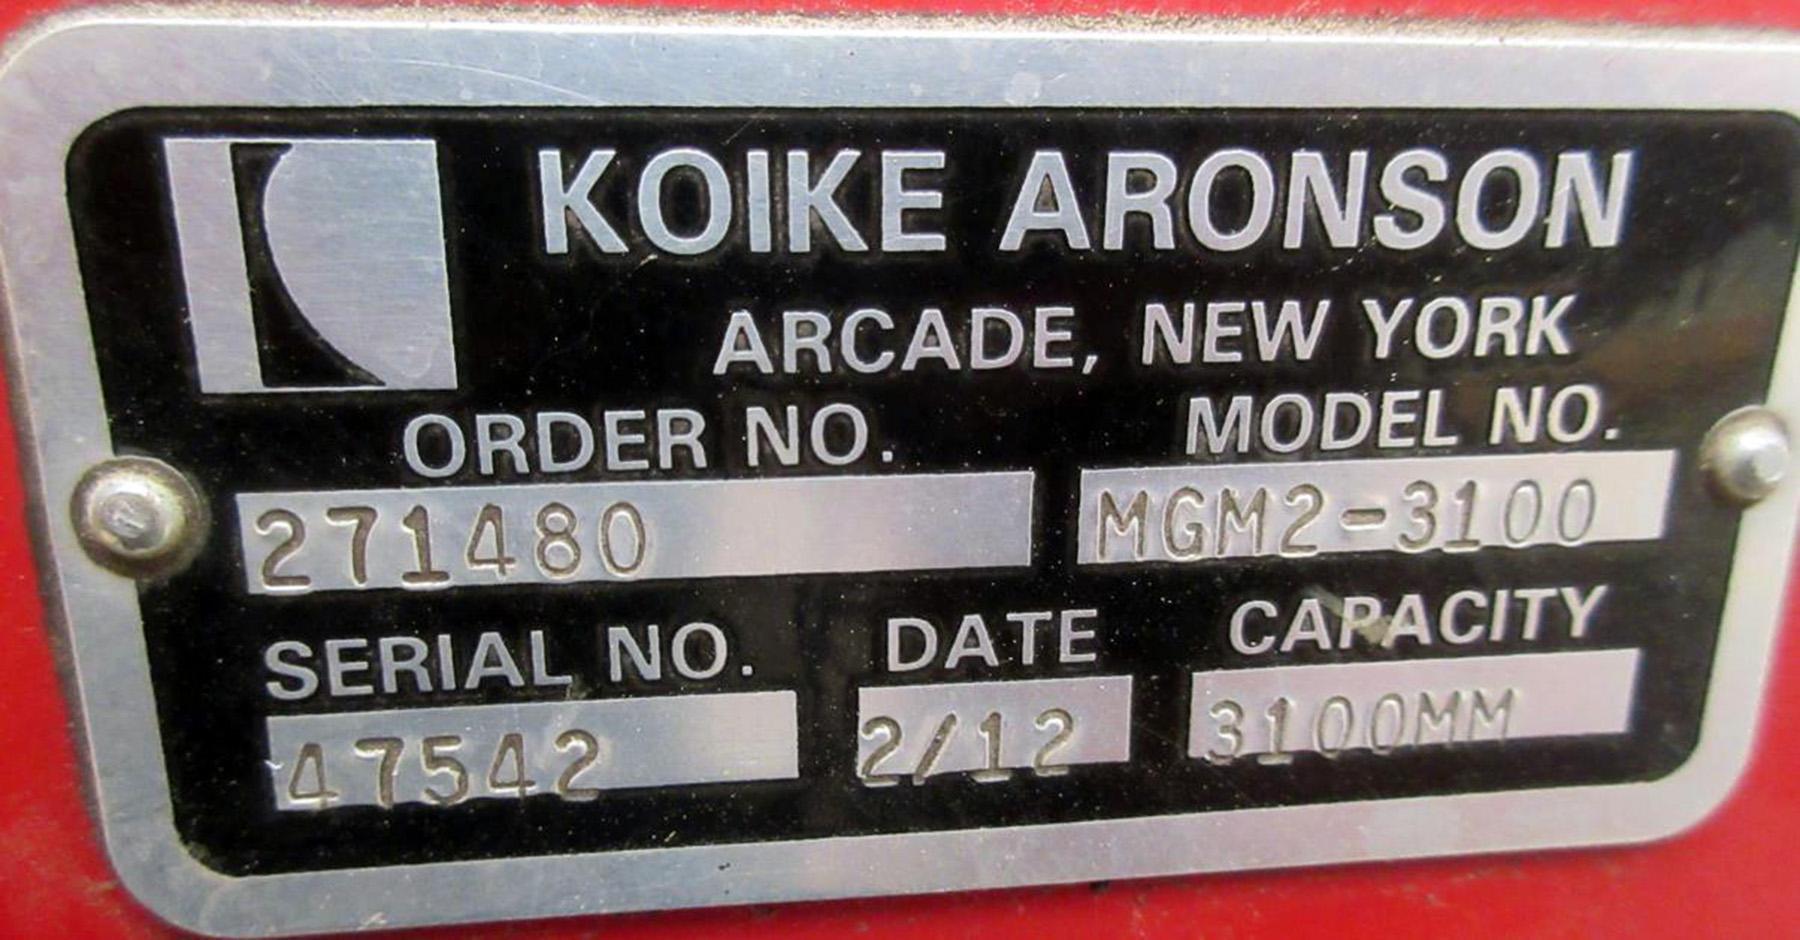 USED, 10' x 40' KOIKE ARONSON MASTERGRAPH-II MILLENIUM SERIES CNC PLASMA CUTTING MACHINE, NEW 2012